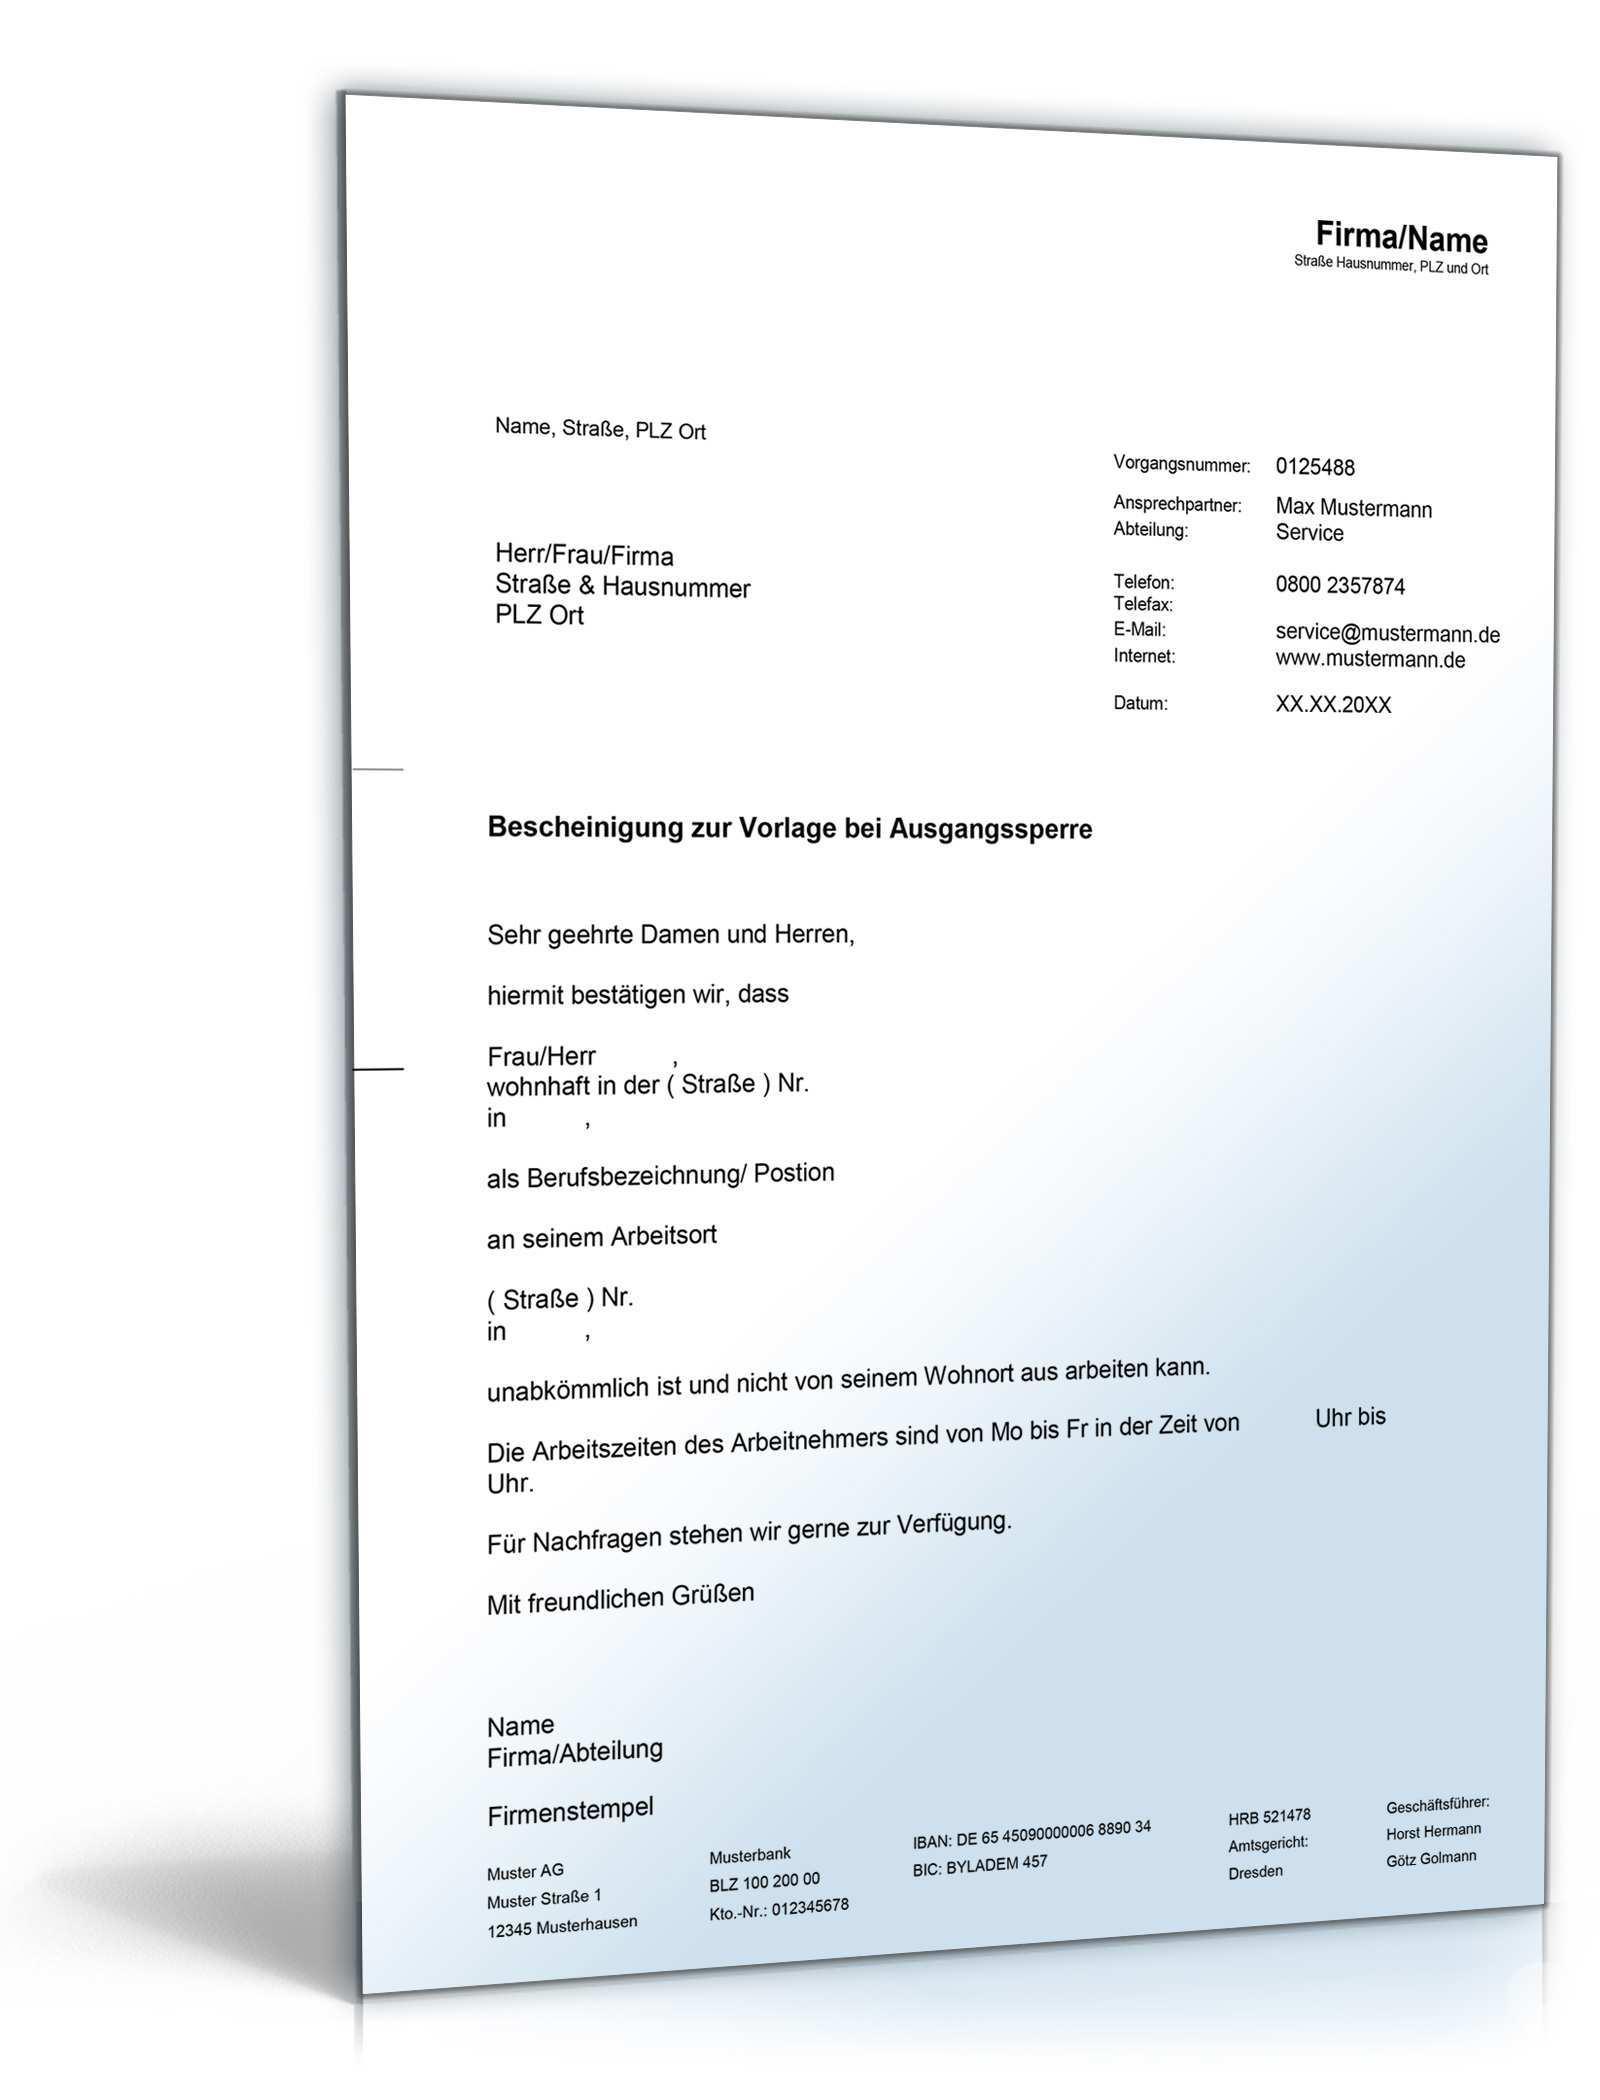 Arbeitgeberbescheinigung Bei Ausgangssperre De Musterbrief Download